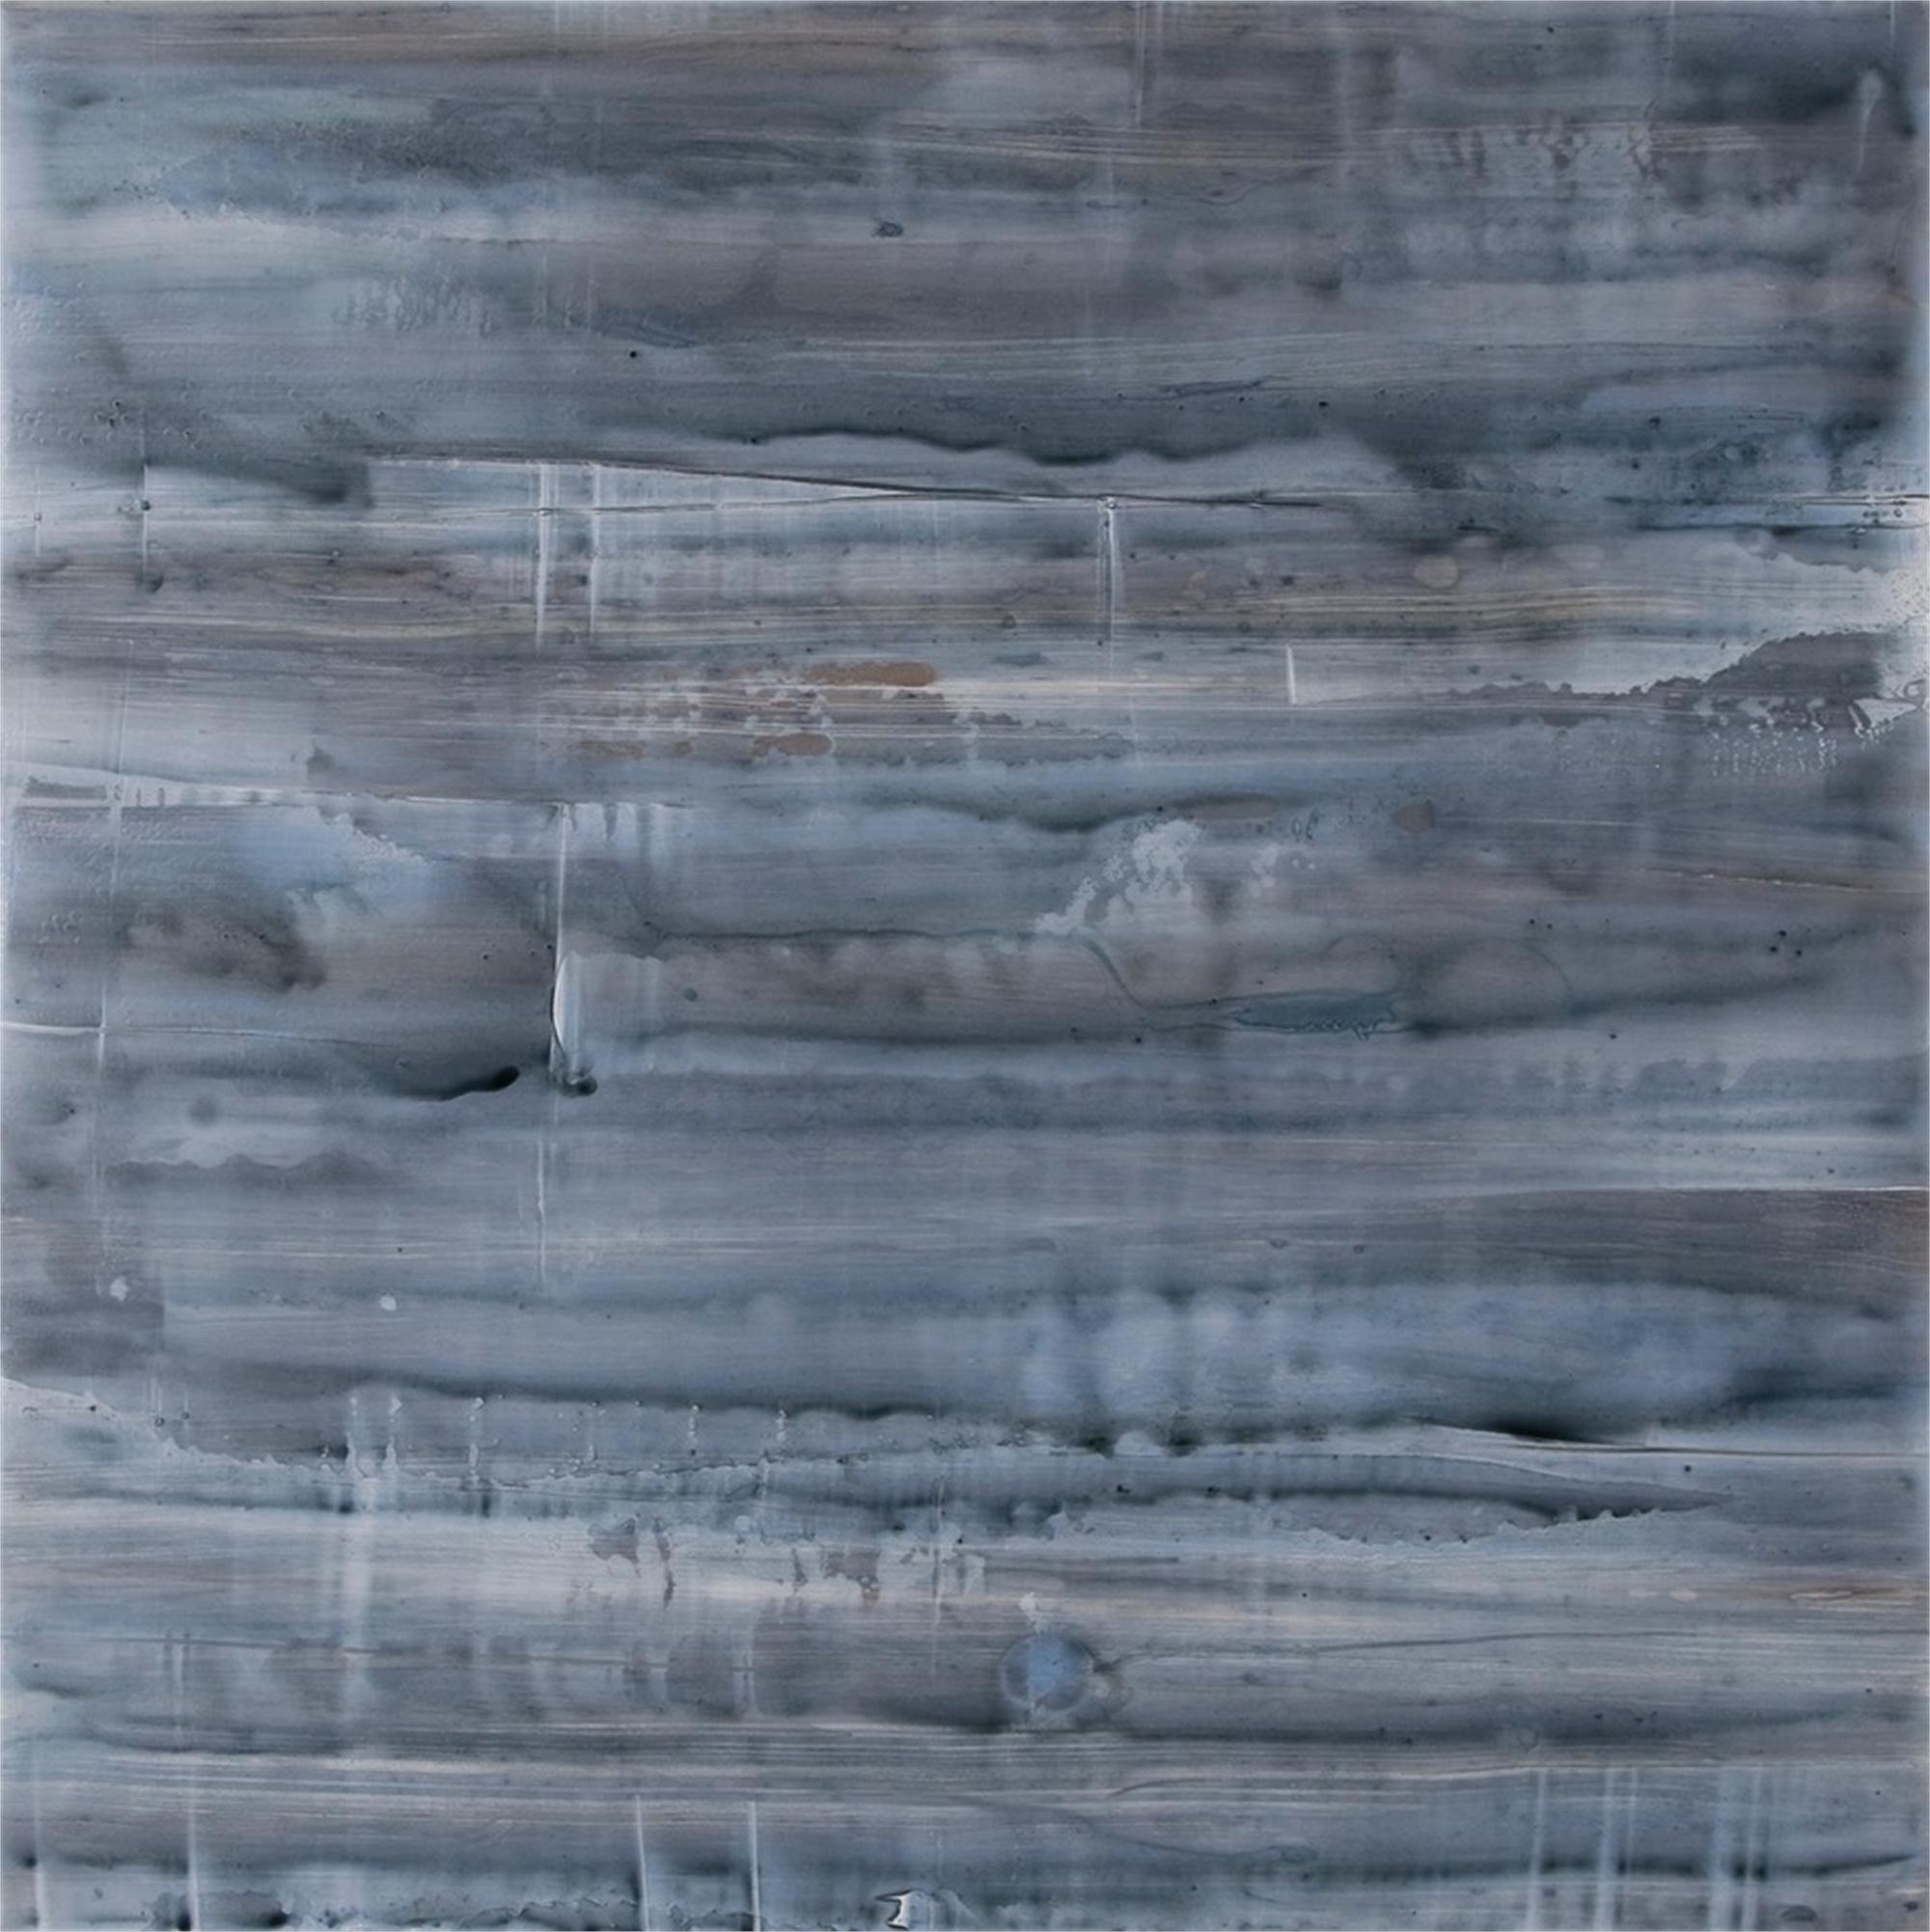 Crossroads no. 1412 by Jessie Morgan